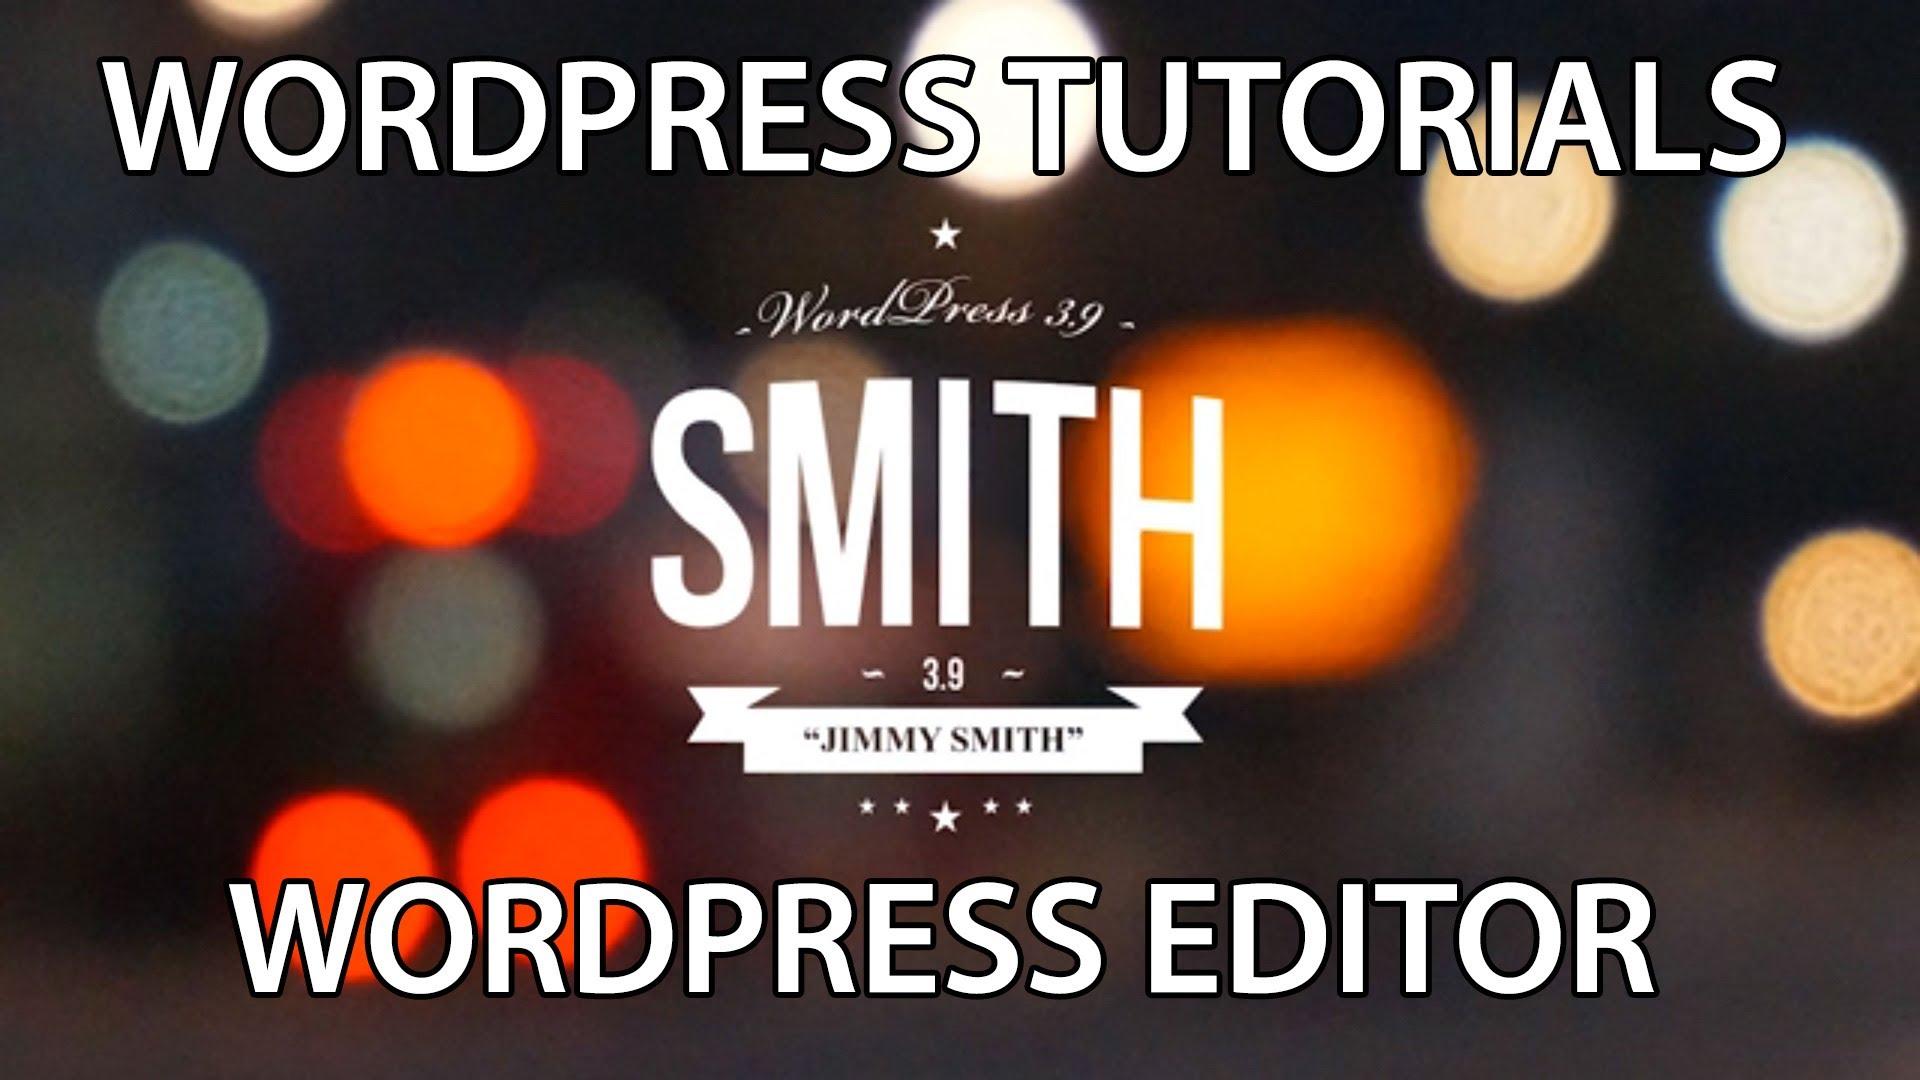 WordPress Tutorial: WordPress Editor